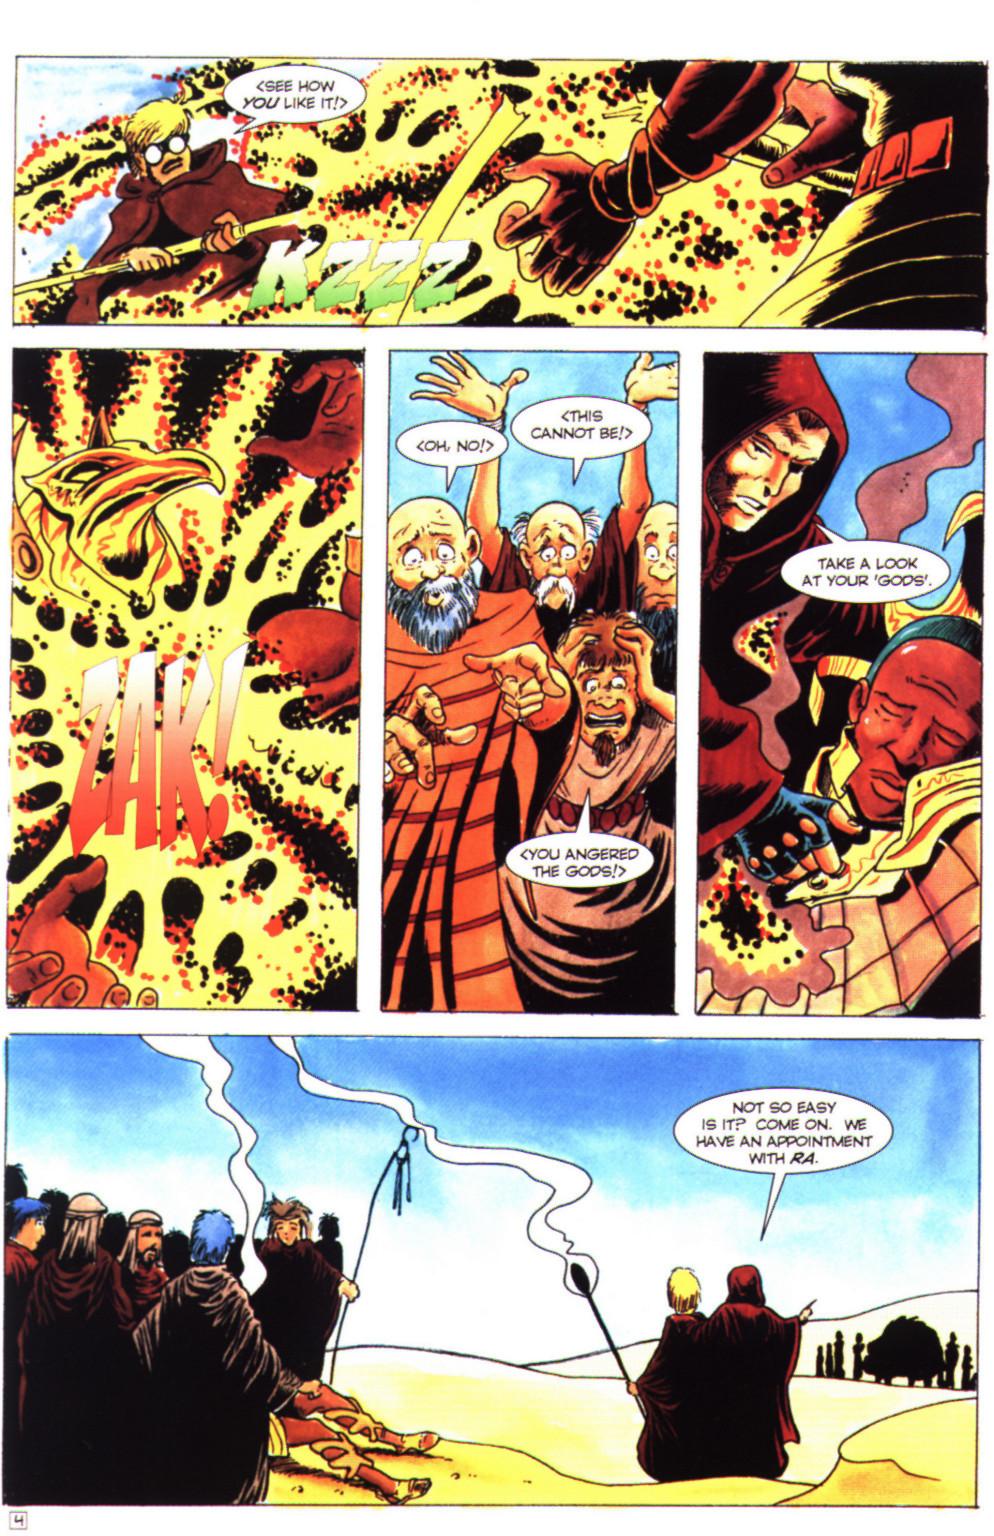 Read online Stargate comic -  Issue #4 - 6